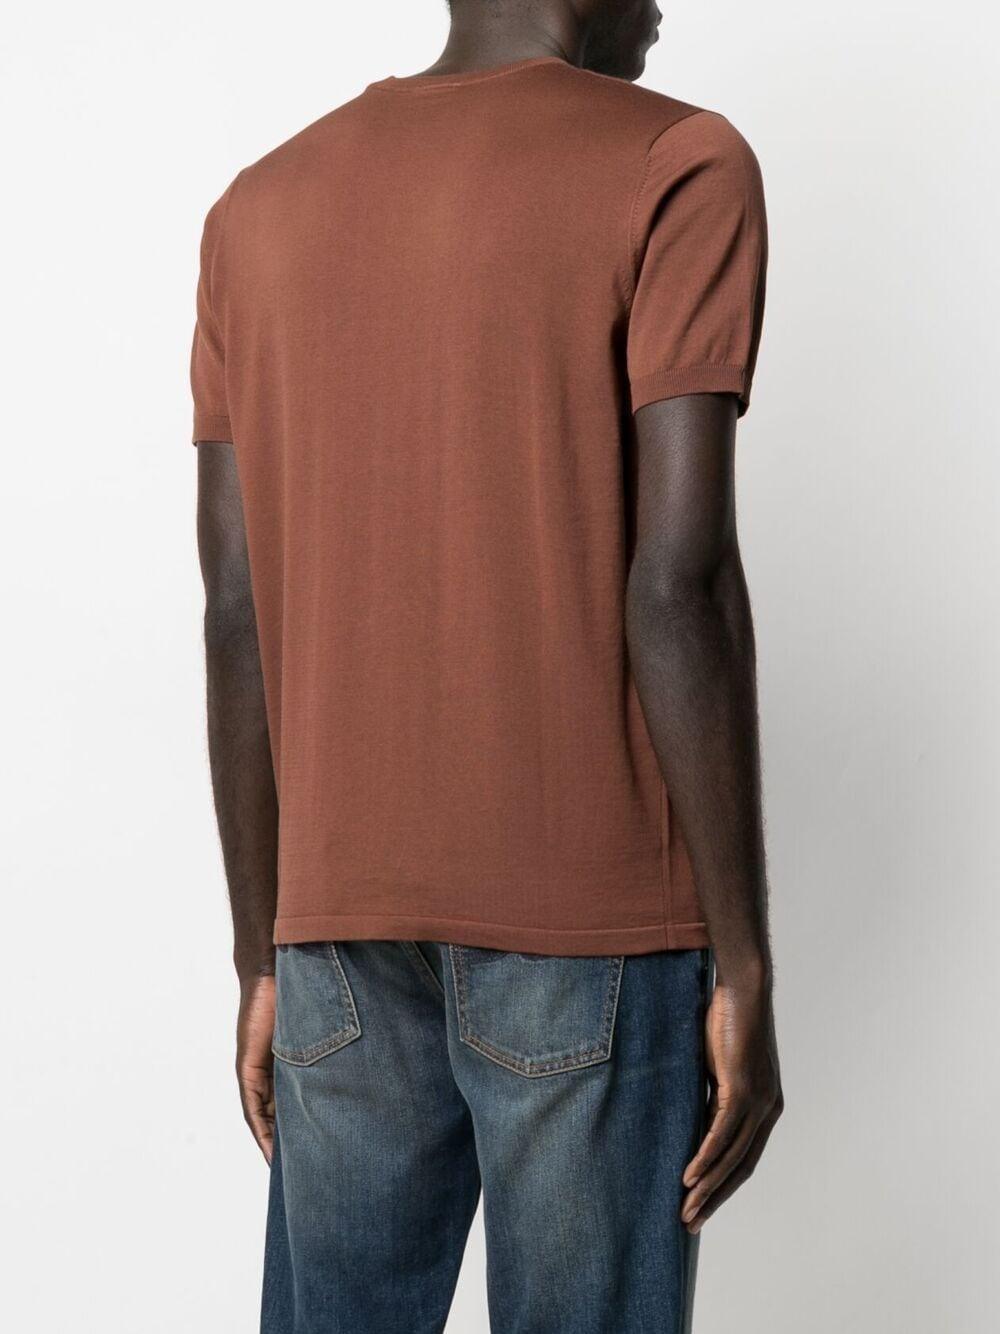 Aspesi t-shirt in cotone uomo marrone ASPESI | T-shirt | M149 337101027